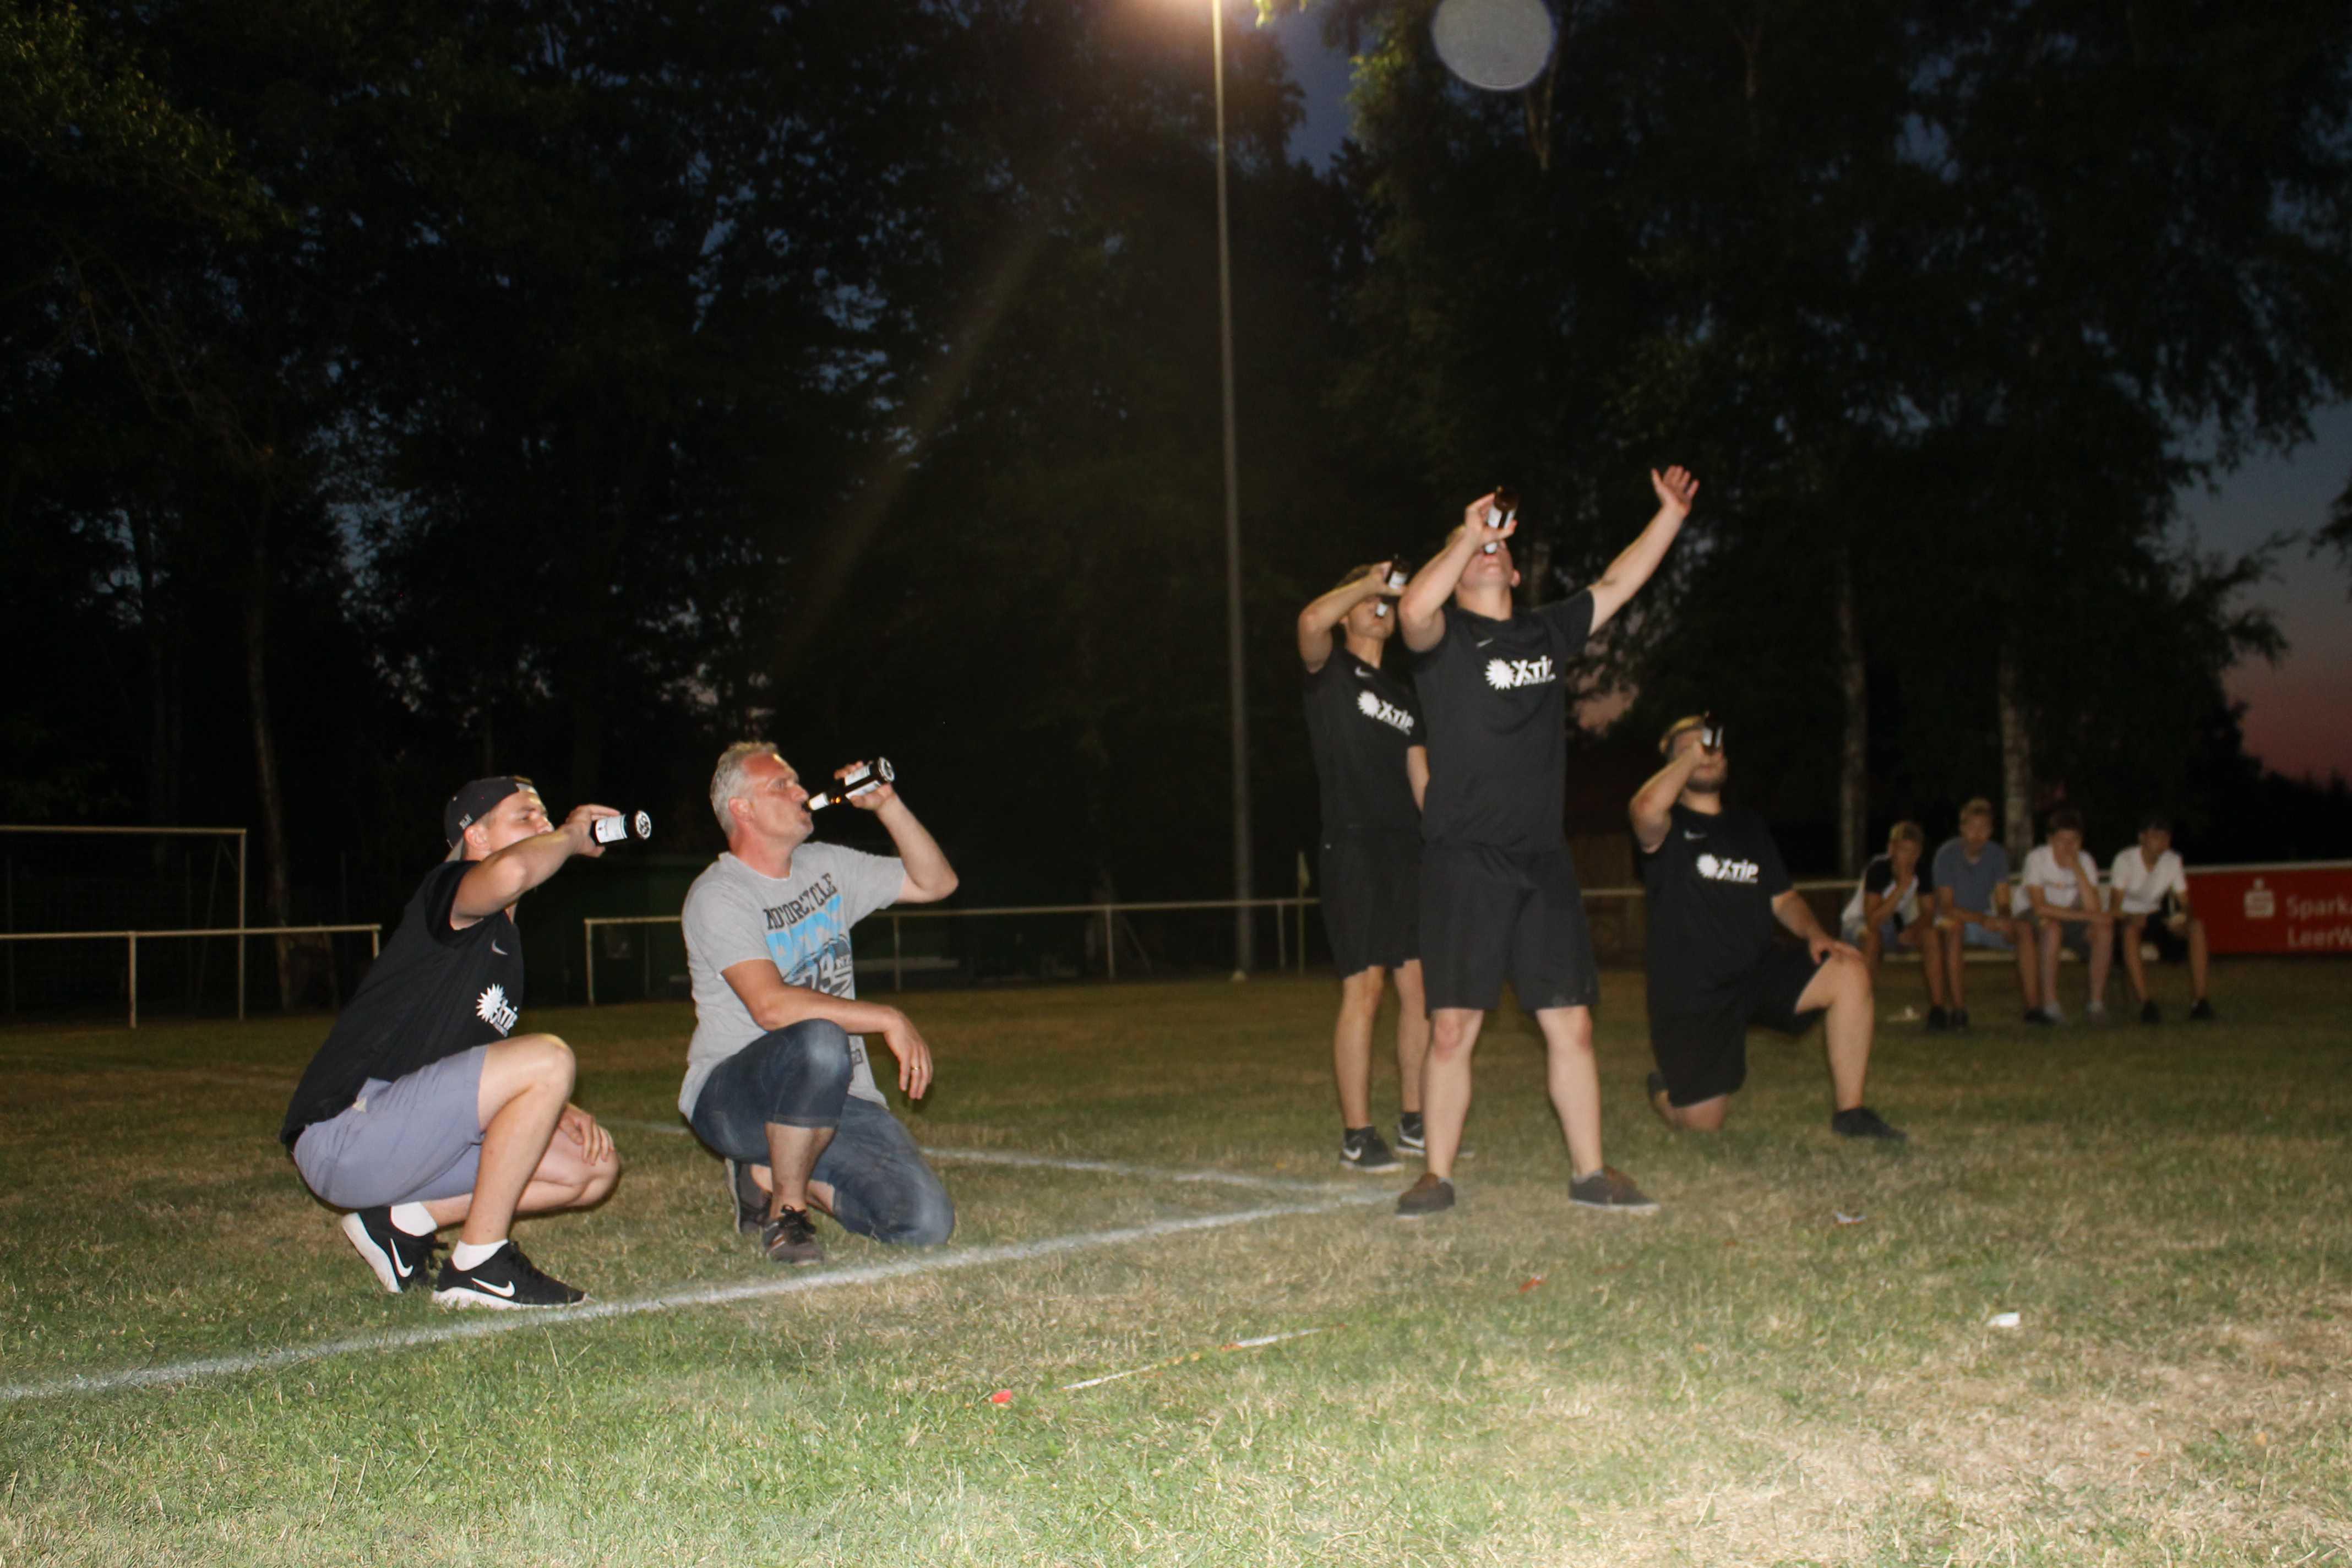 2018-07-27 Sportwoche - Flunkyball Turnier (67)